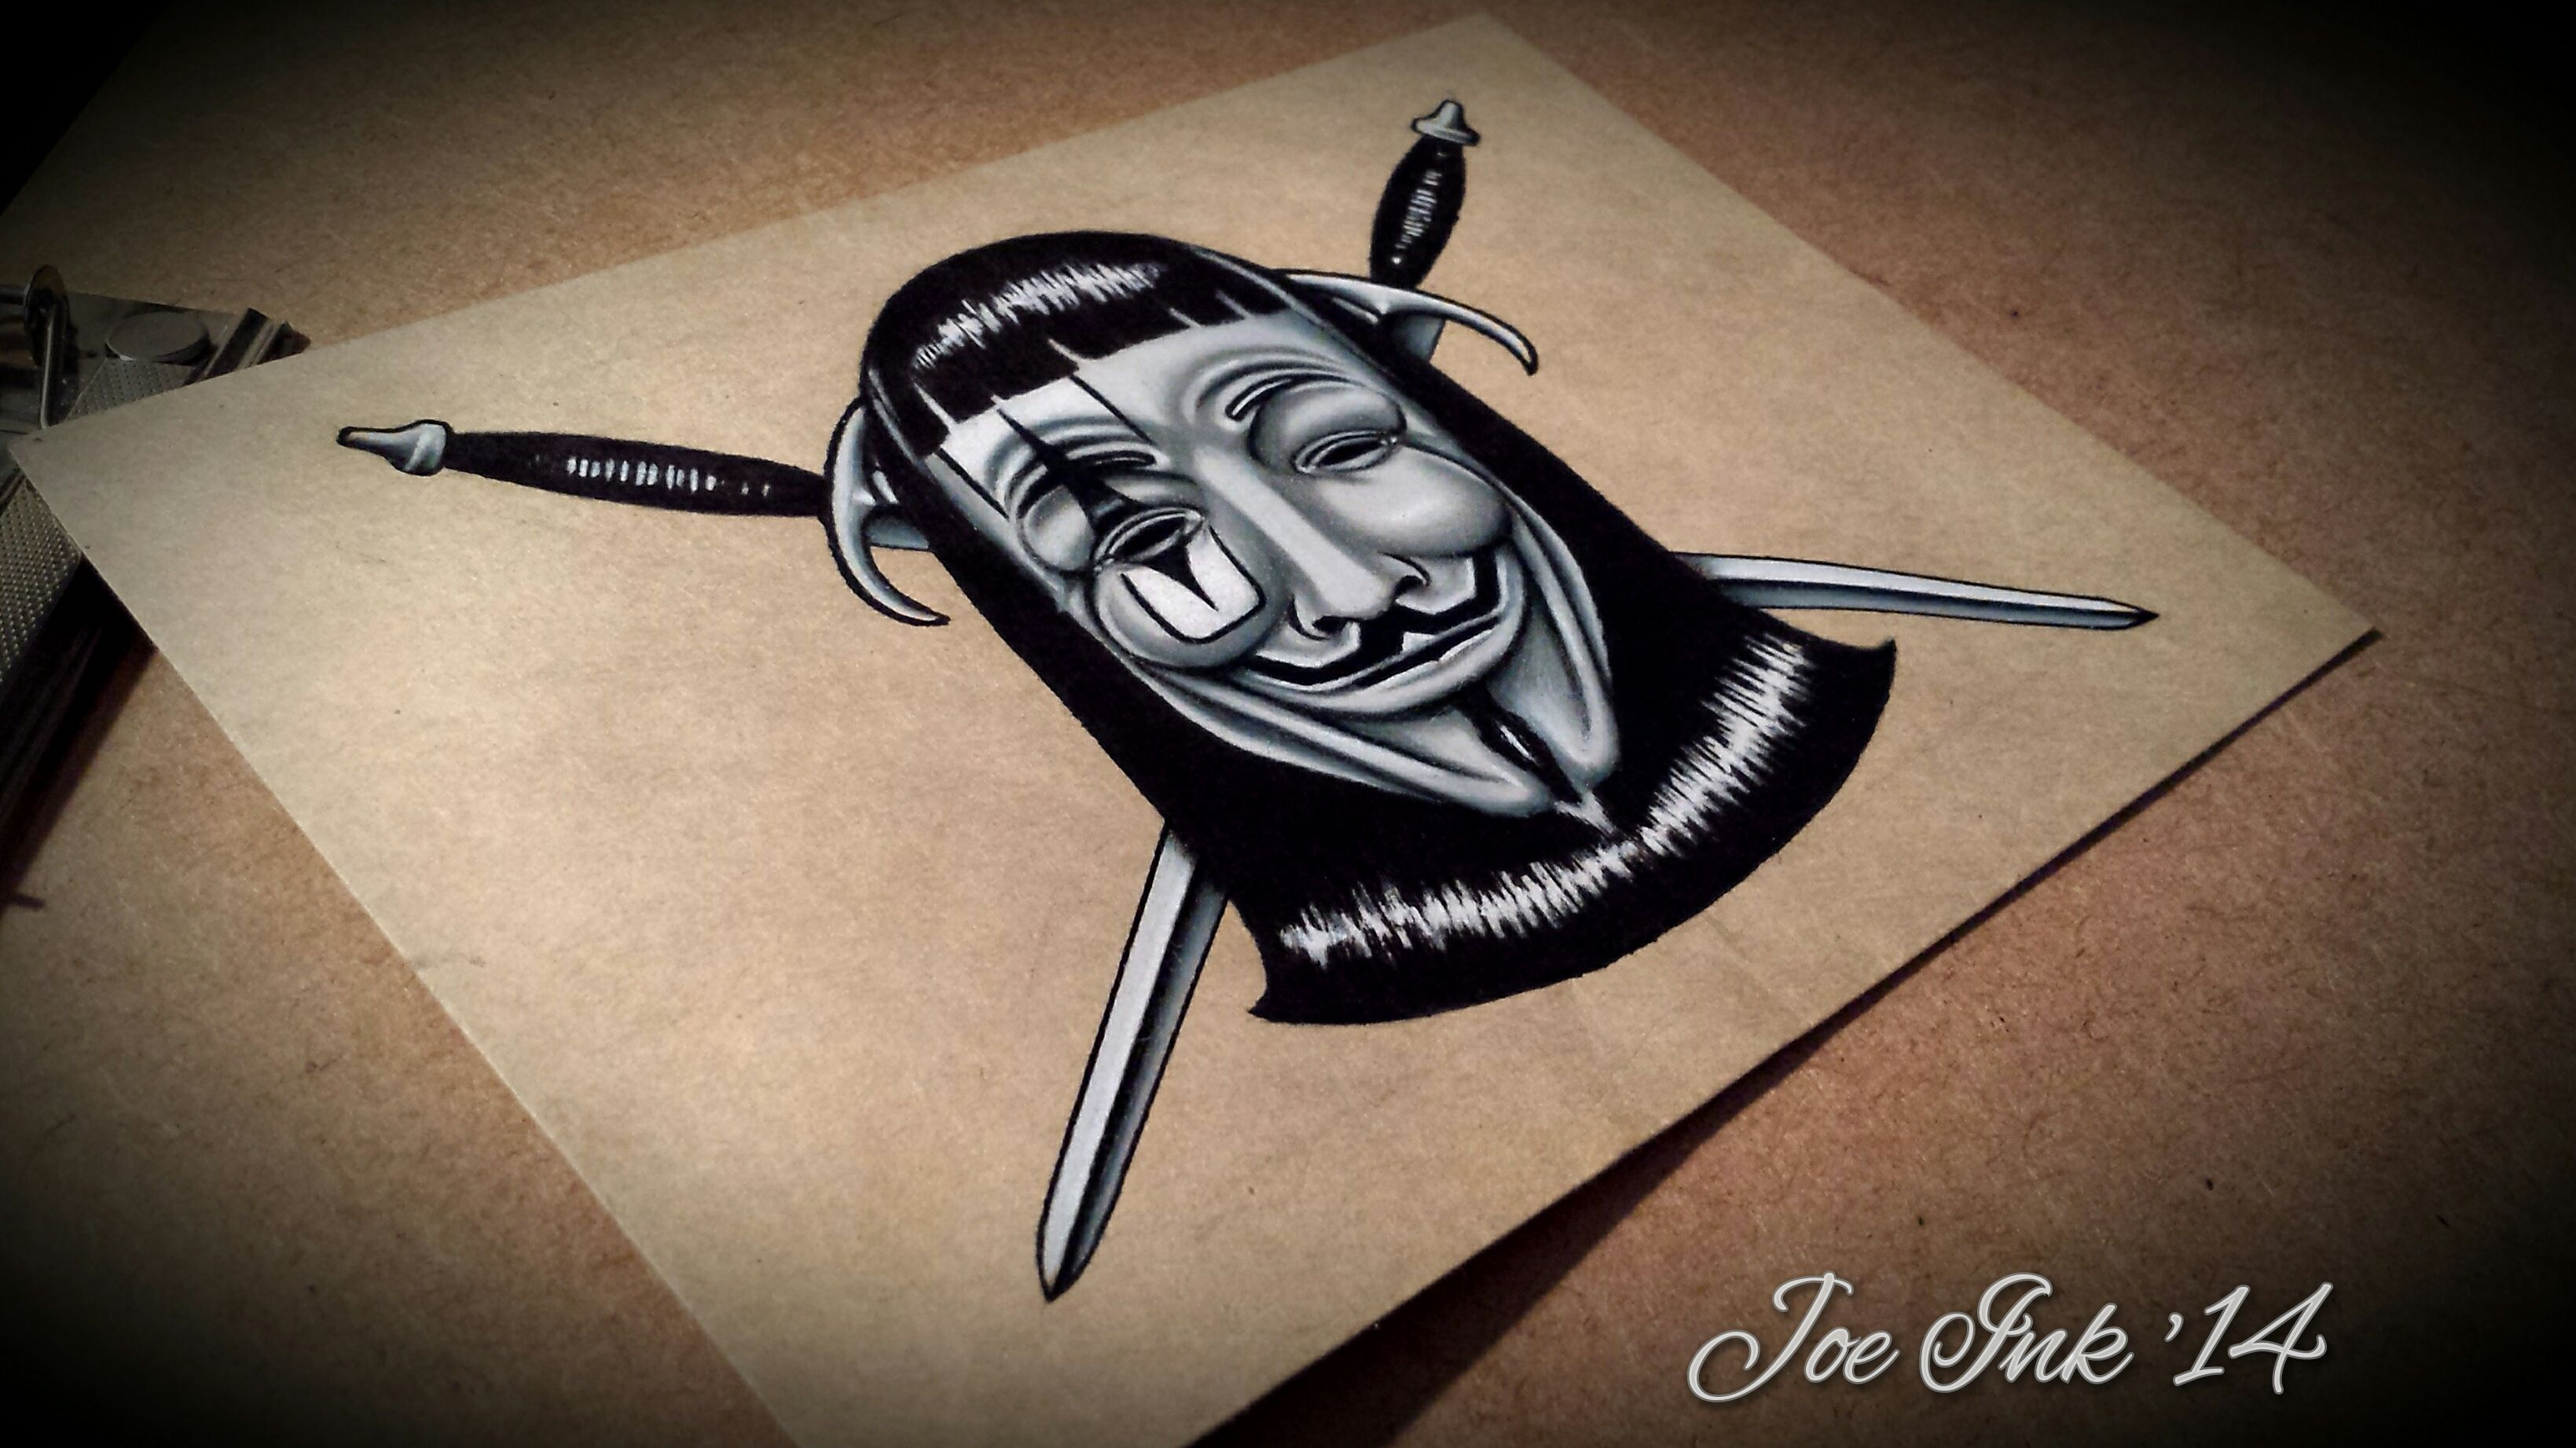 3278x1843 My Version Of The V For Vendetta Mask! Color Pencil, Marker